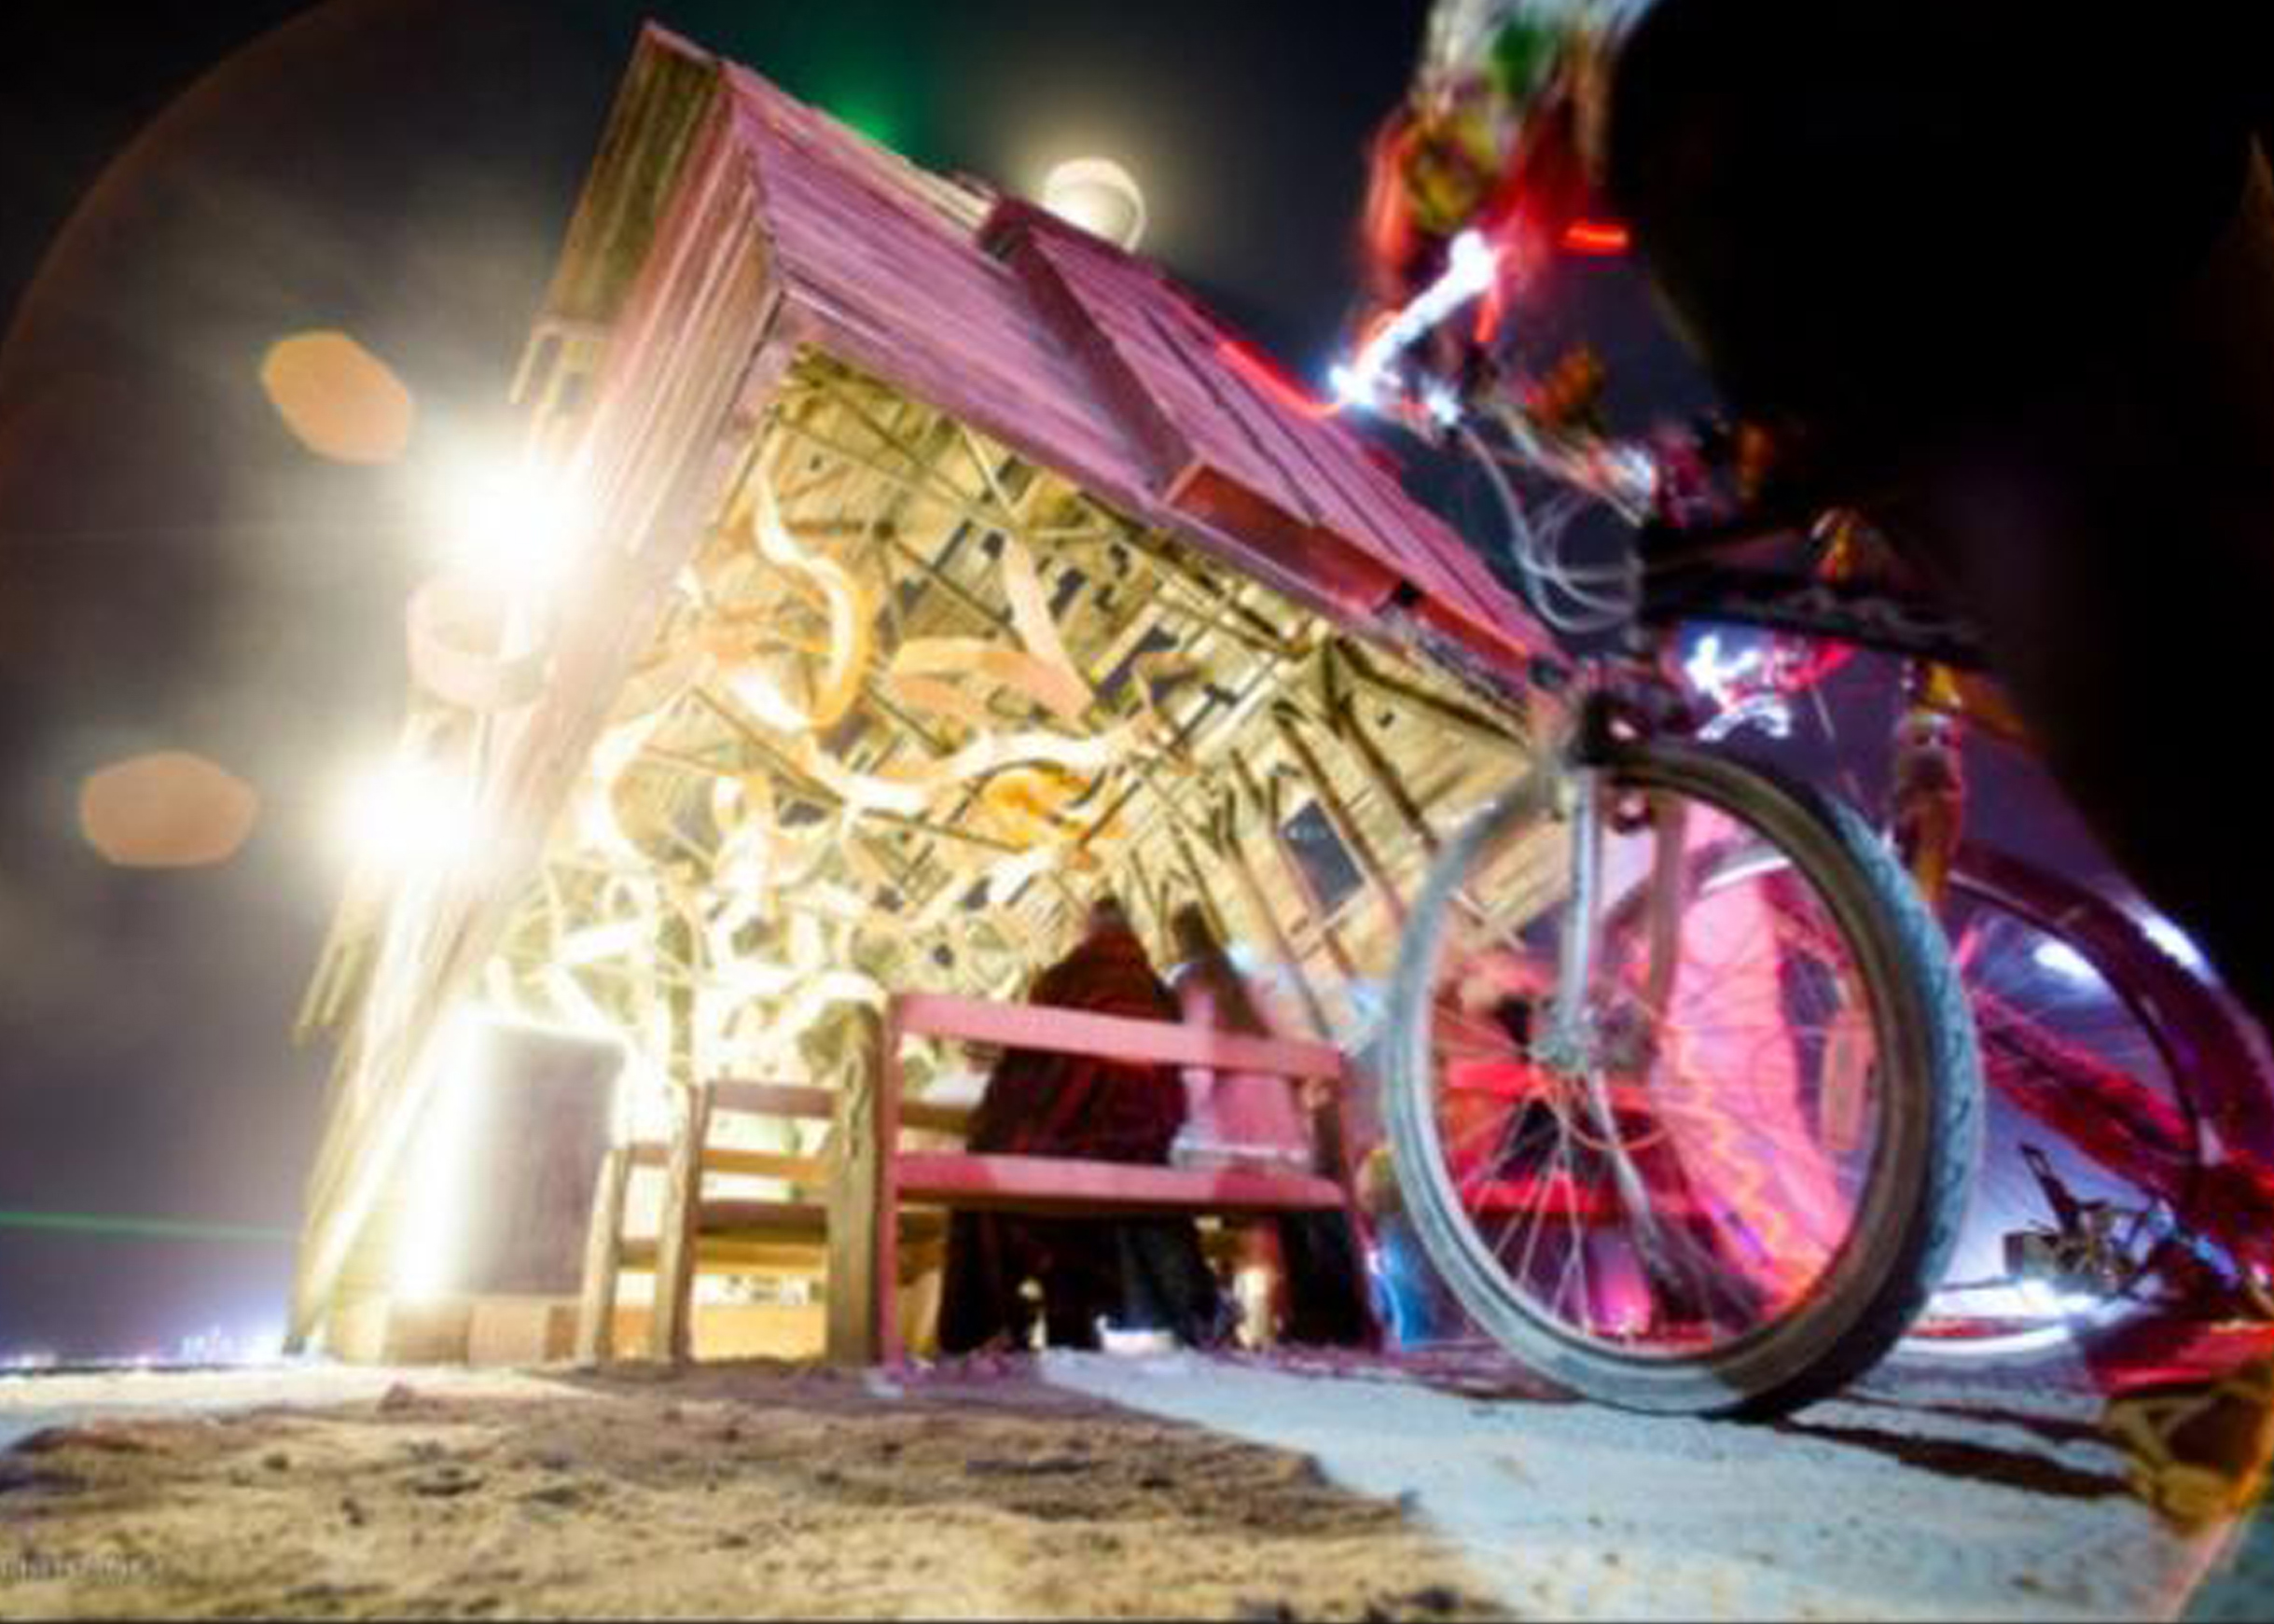 Looking inside at Ribbons of Music at The Church Trap. Jena Priebe. Burning Man 2013.jpg